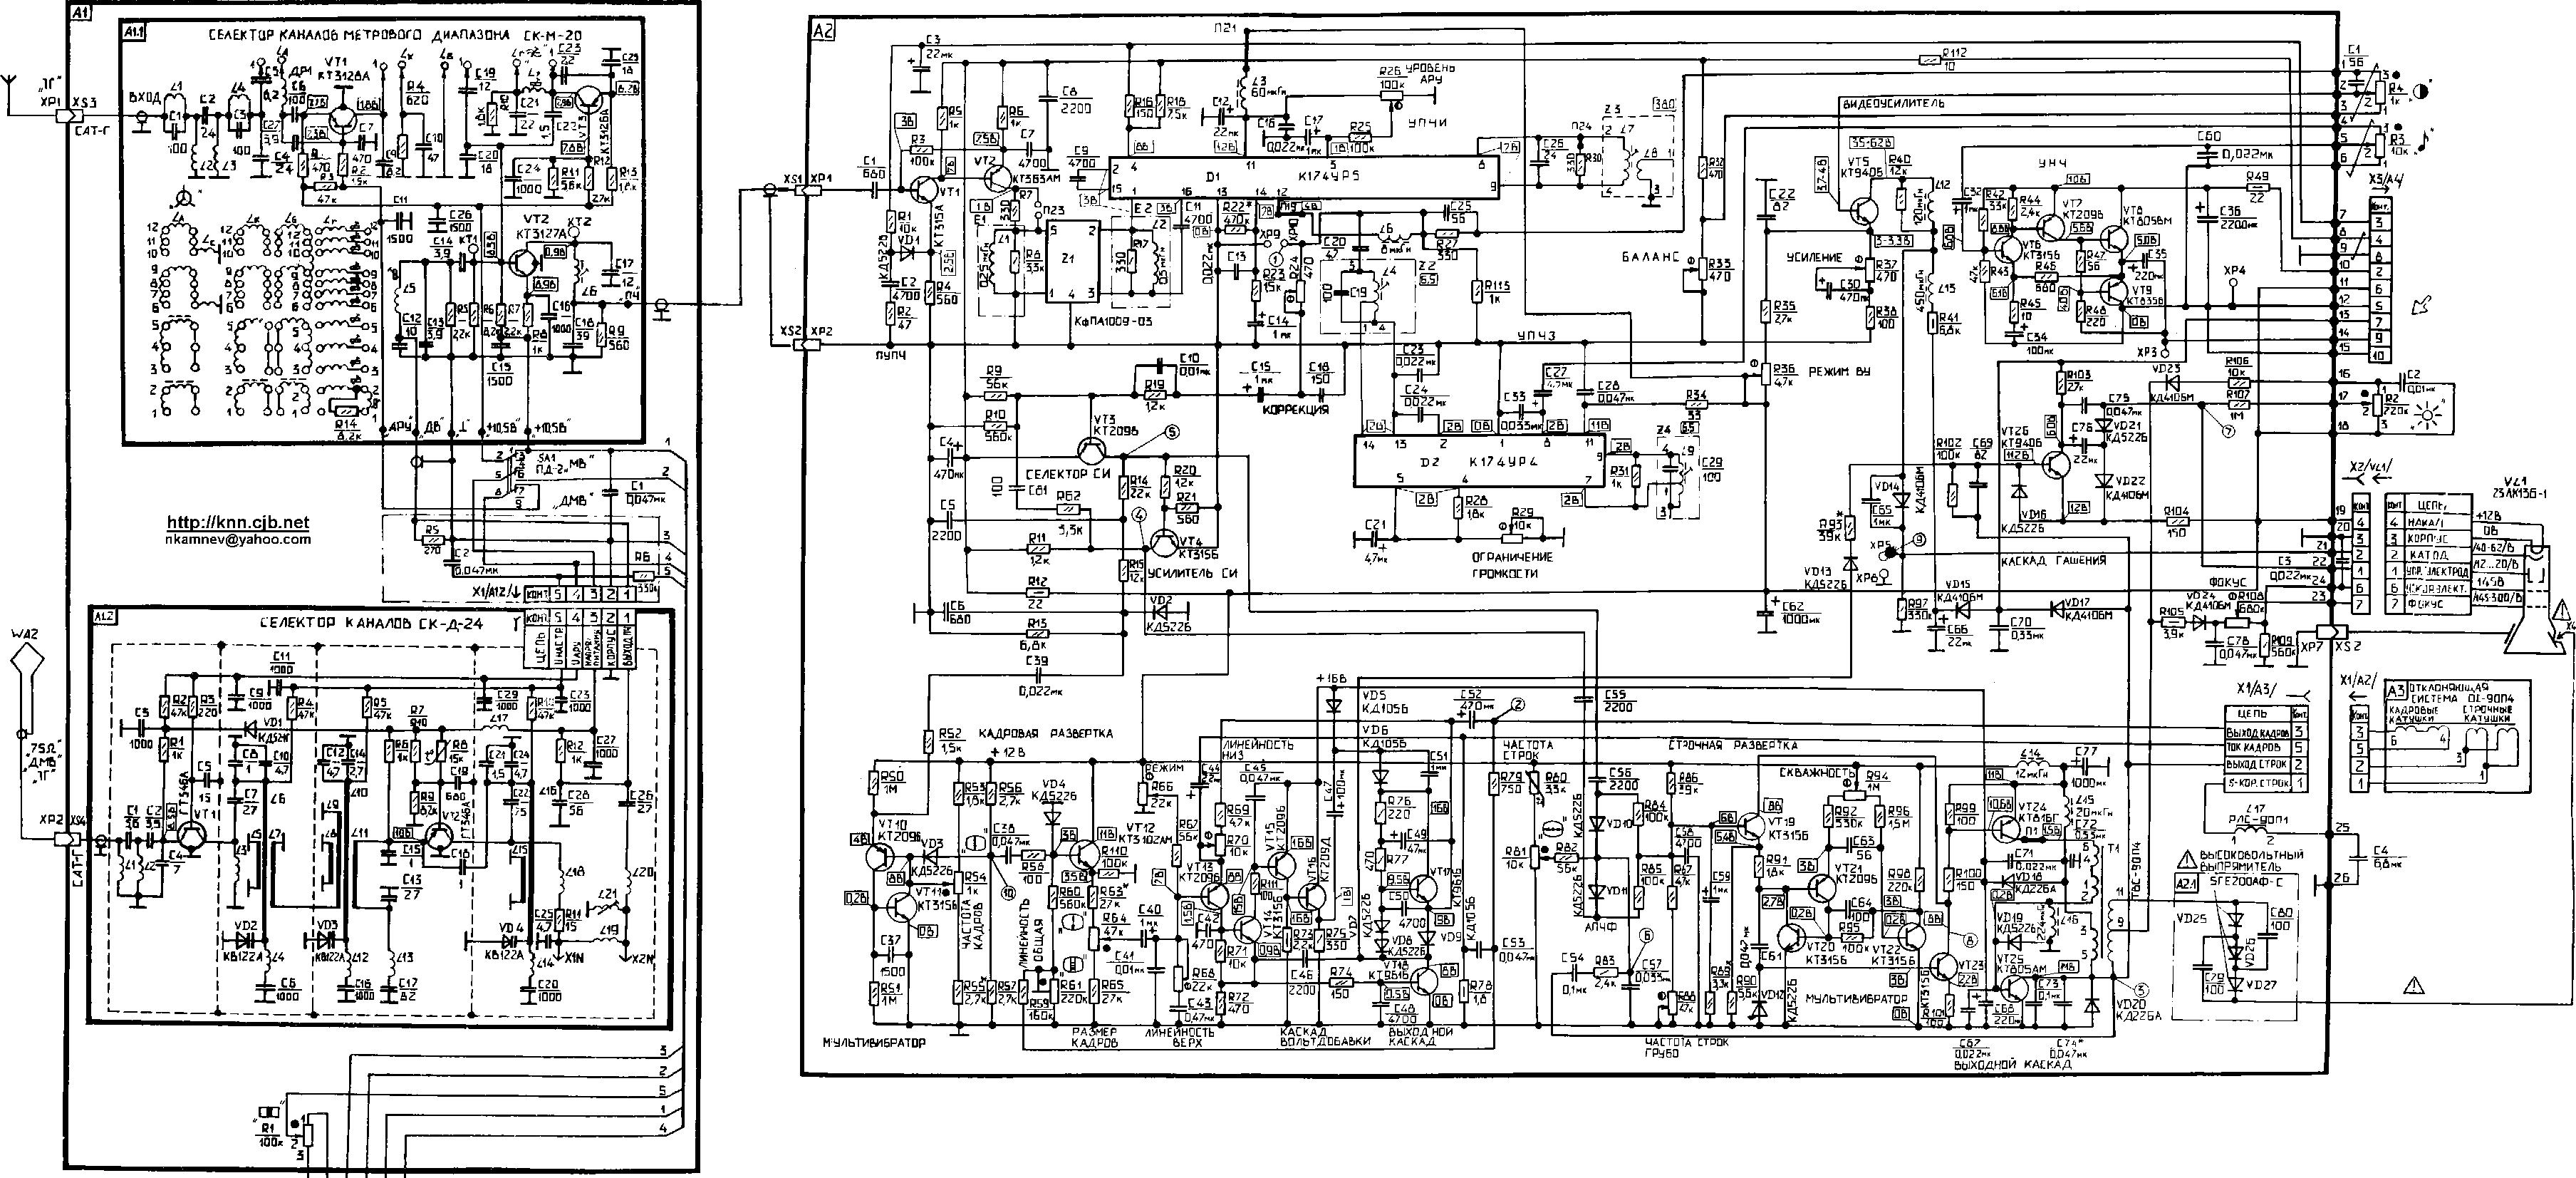 Схему телевизора электроника 23тб-307д